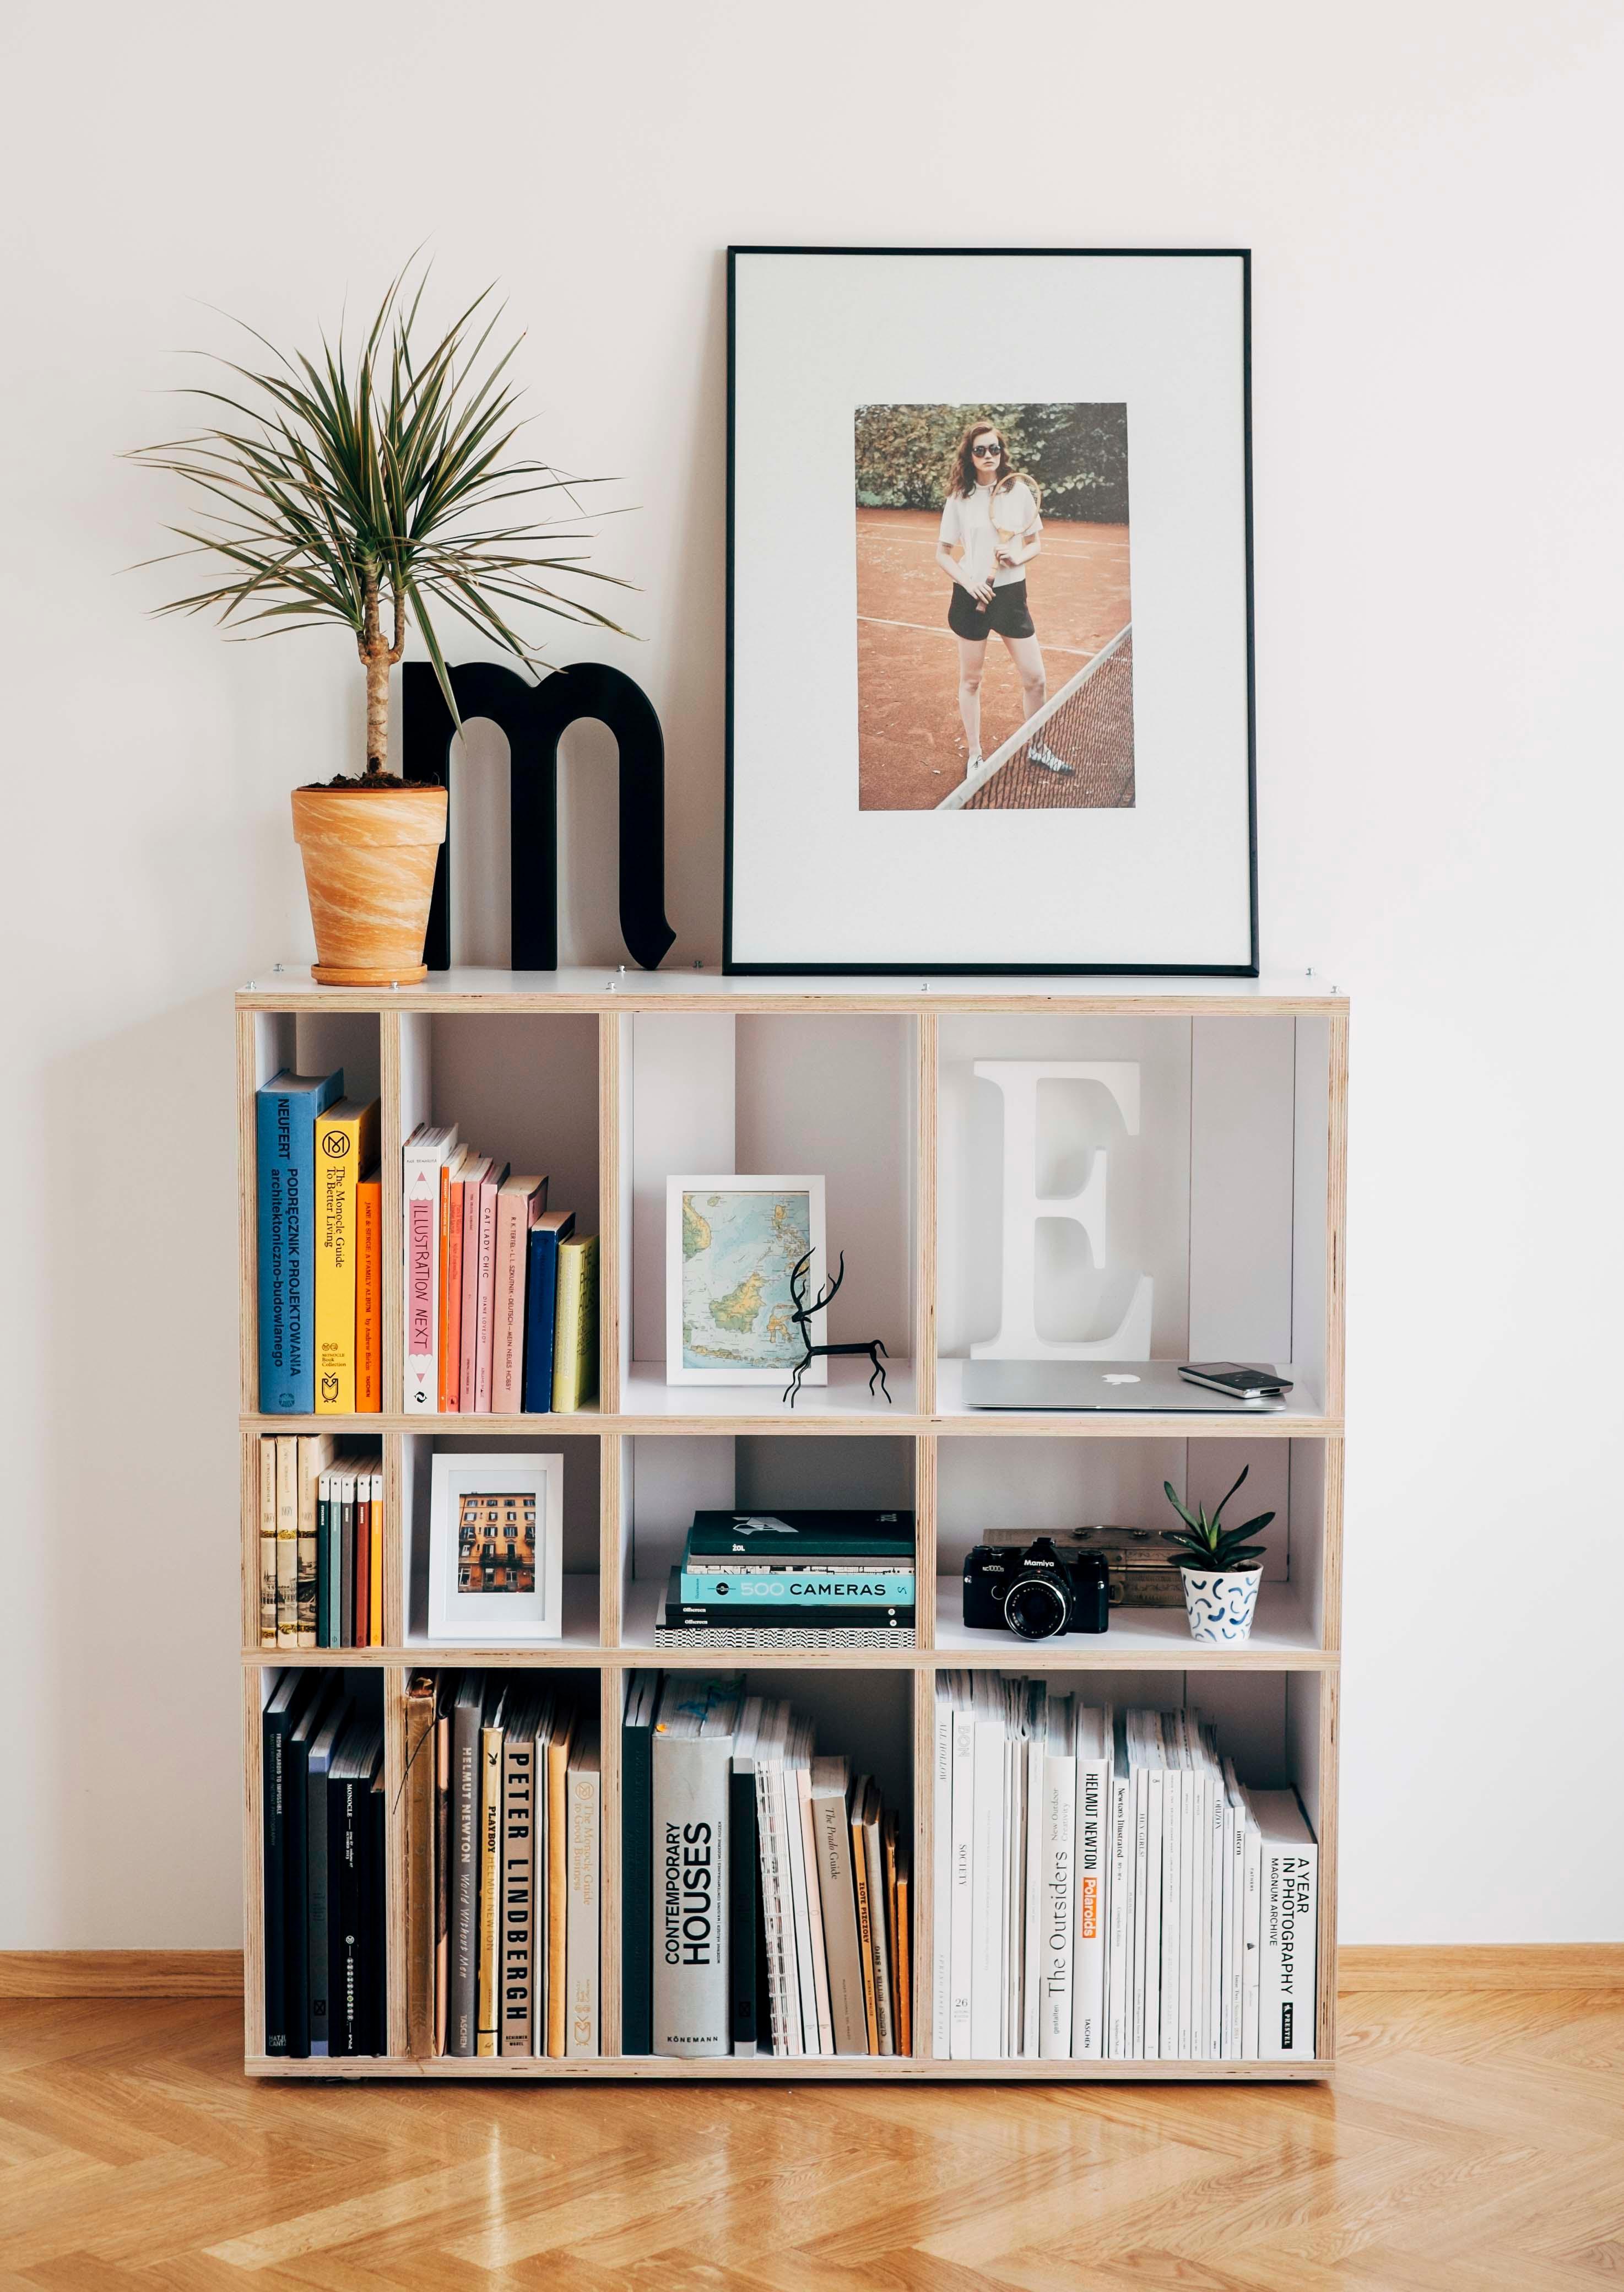 büro • bilder & ideen • couchstyle, Hause deko